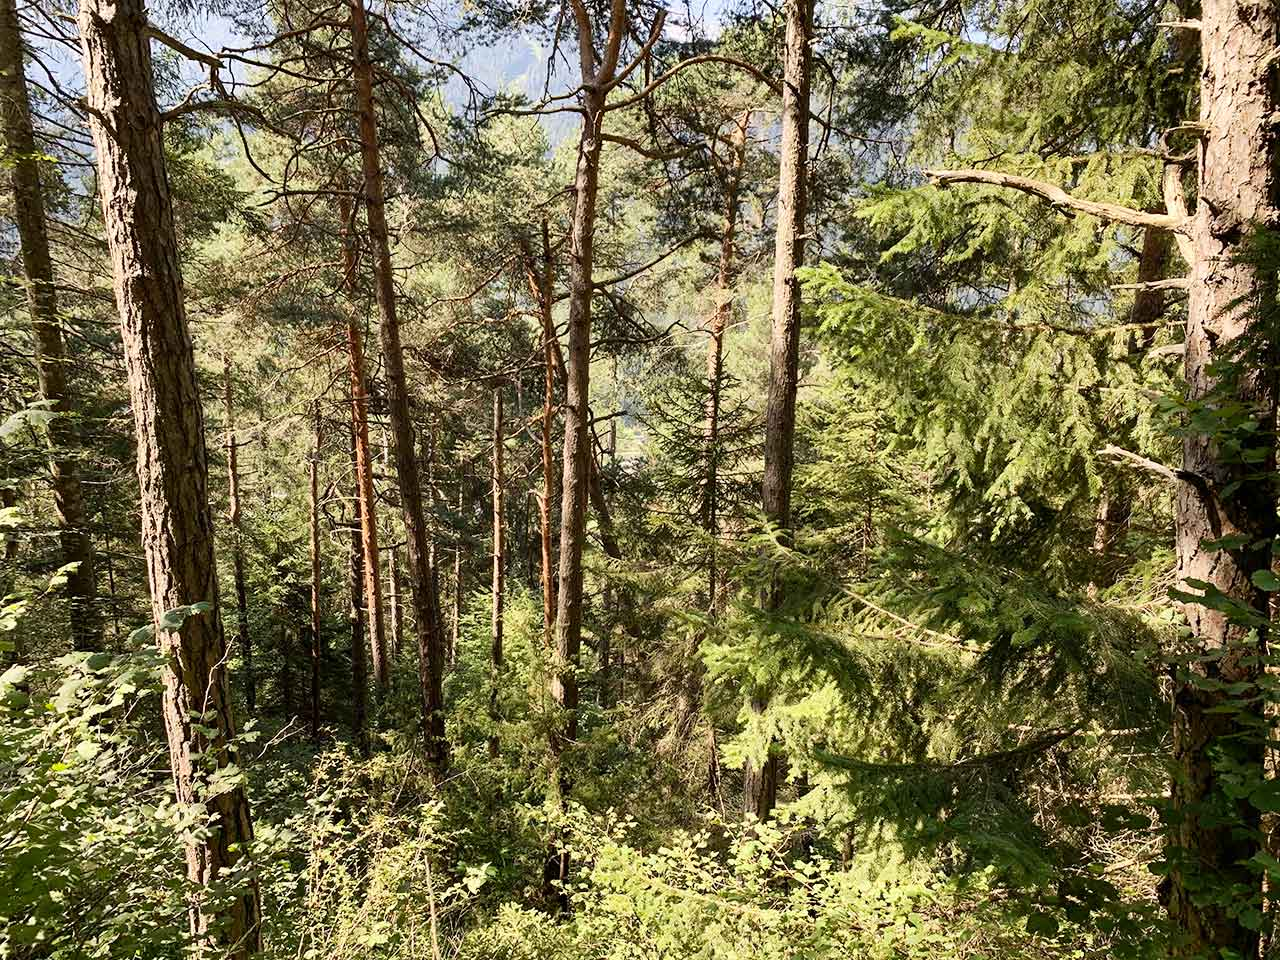 auronzo-bosco-bersaglio-abeti